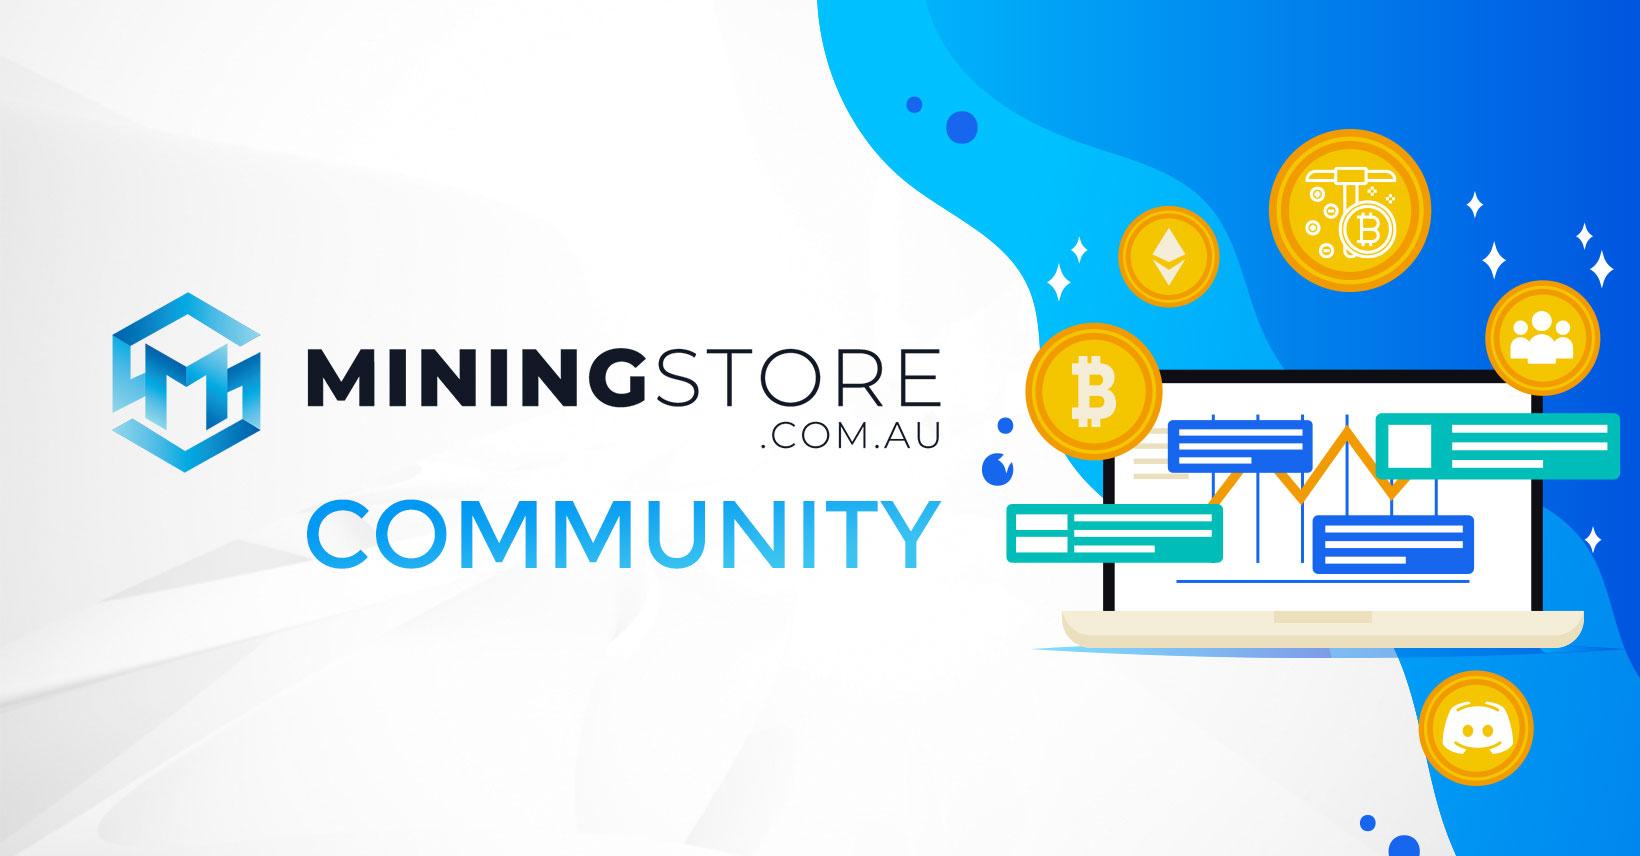 mining-store-community-img